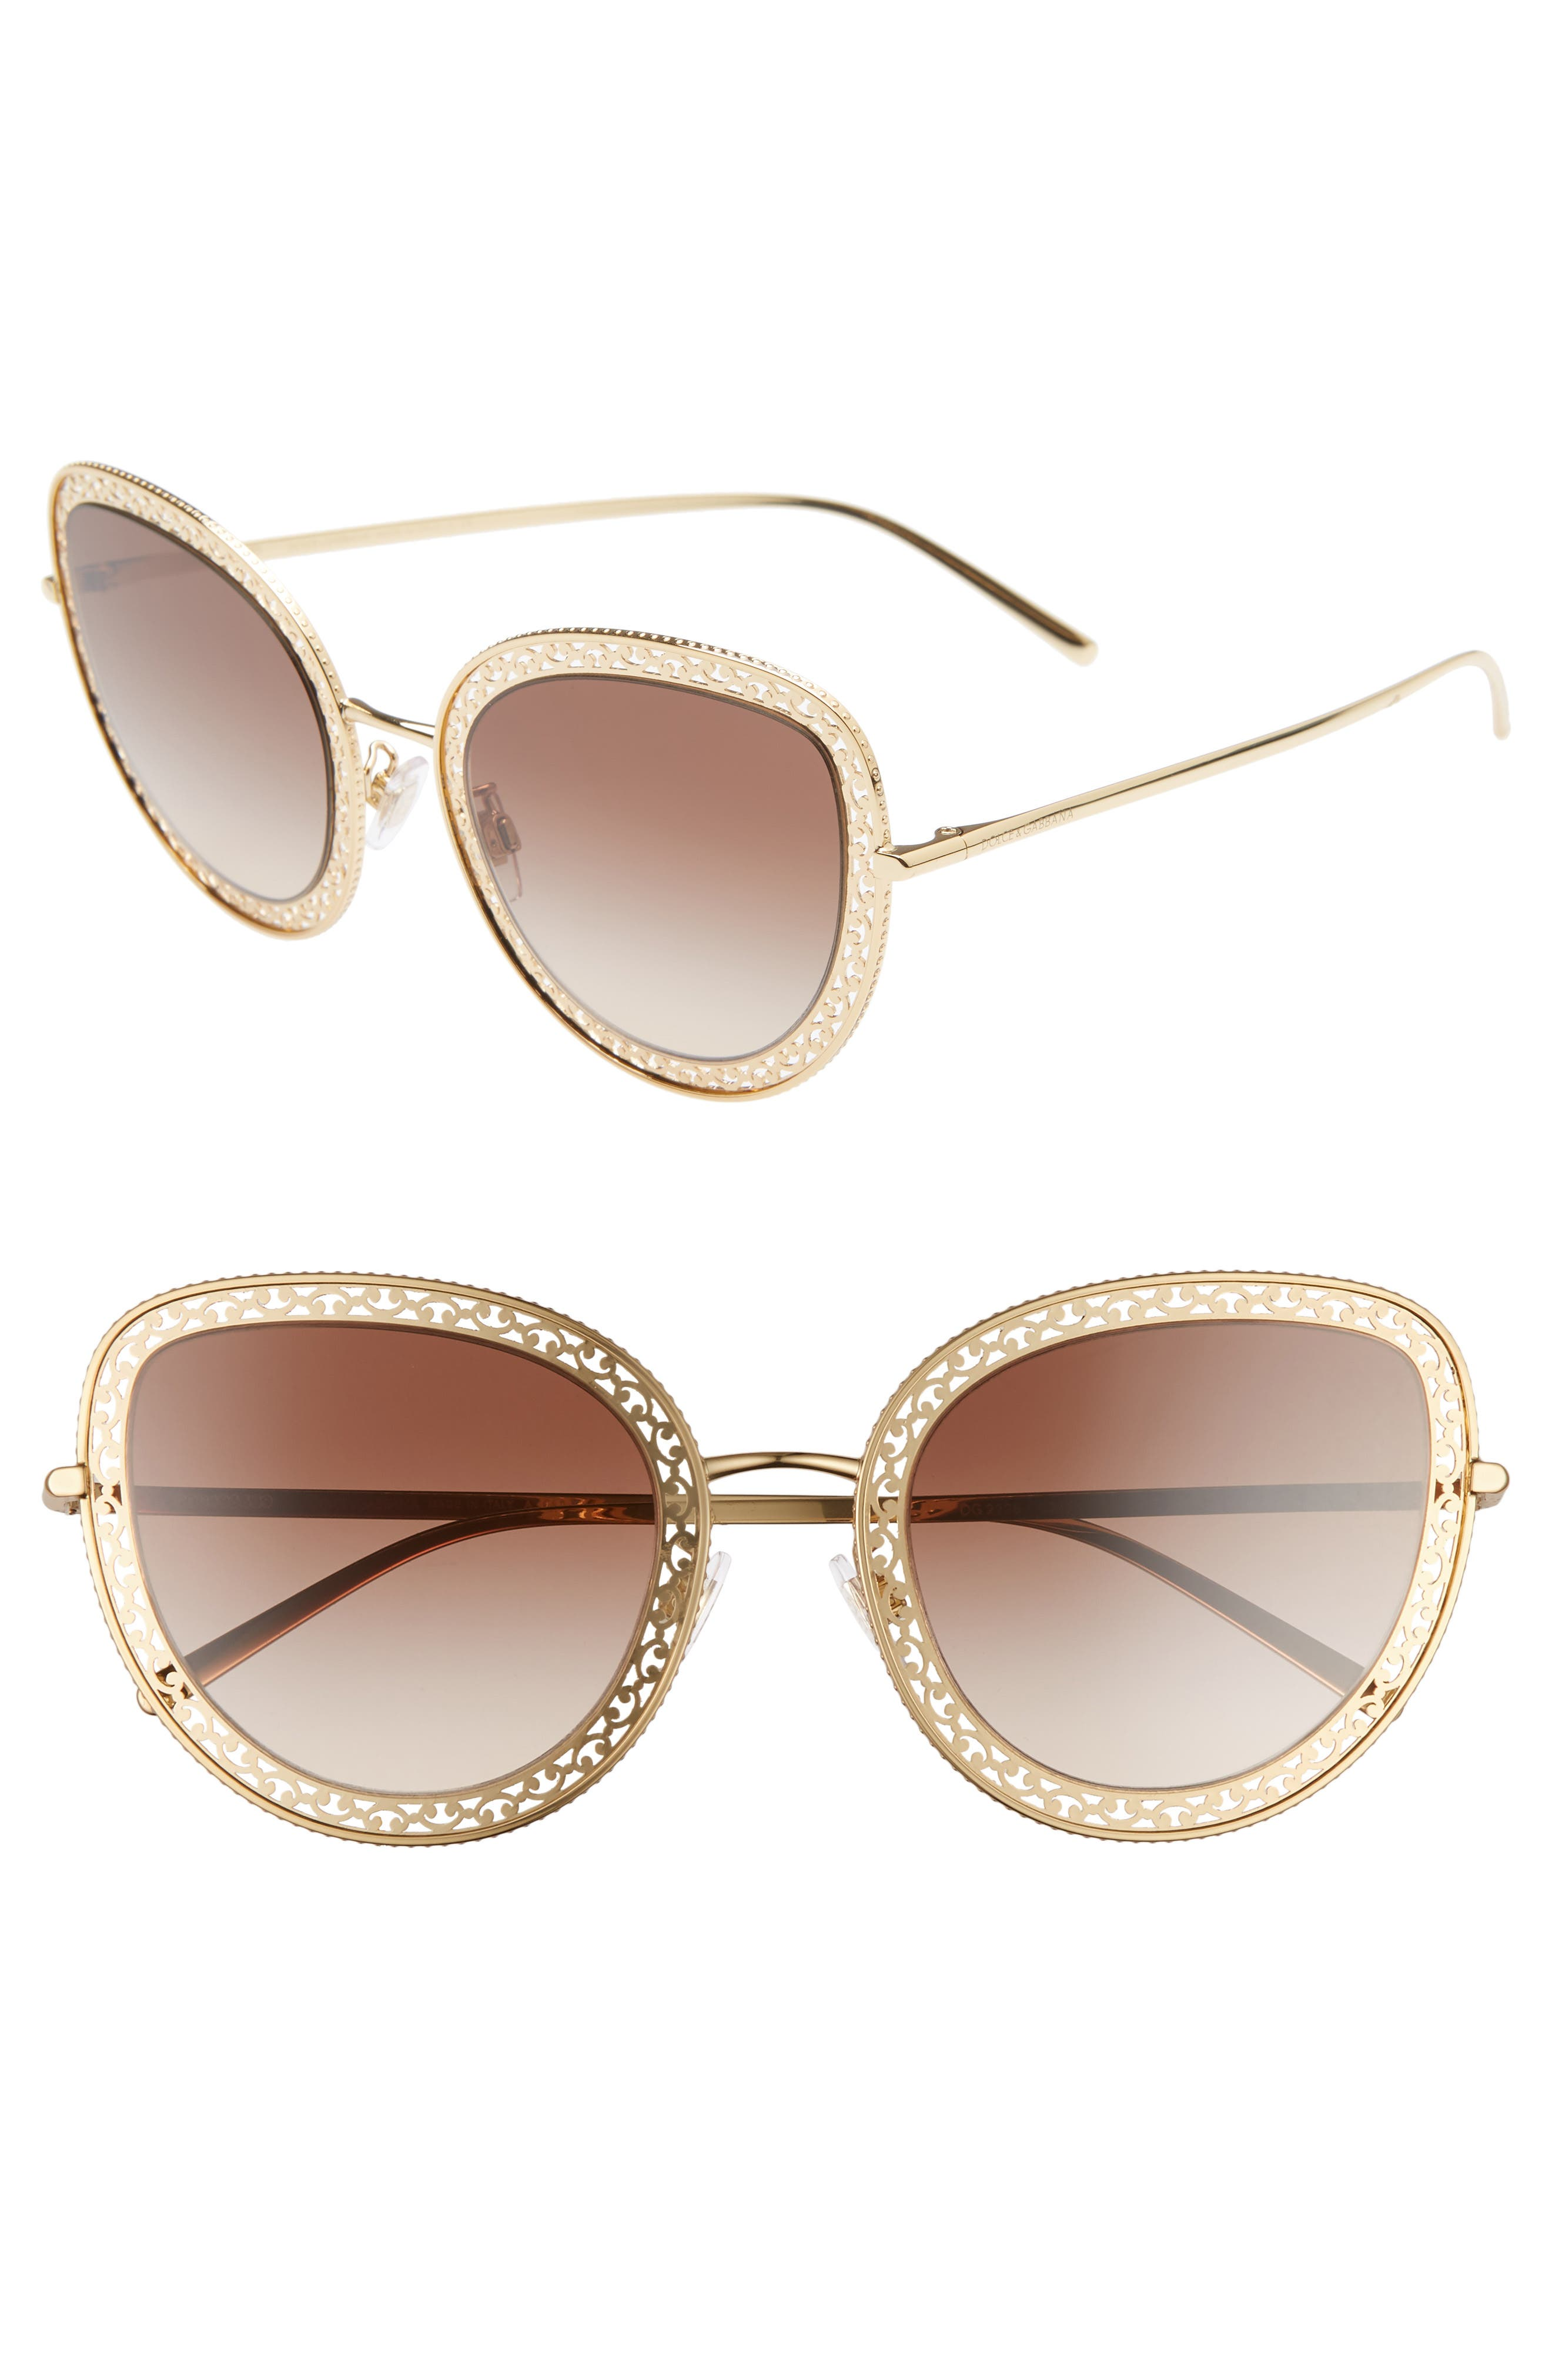 Dolce & gabbana 5m Cat Eye Sunglasses - Gold/ Brown